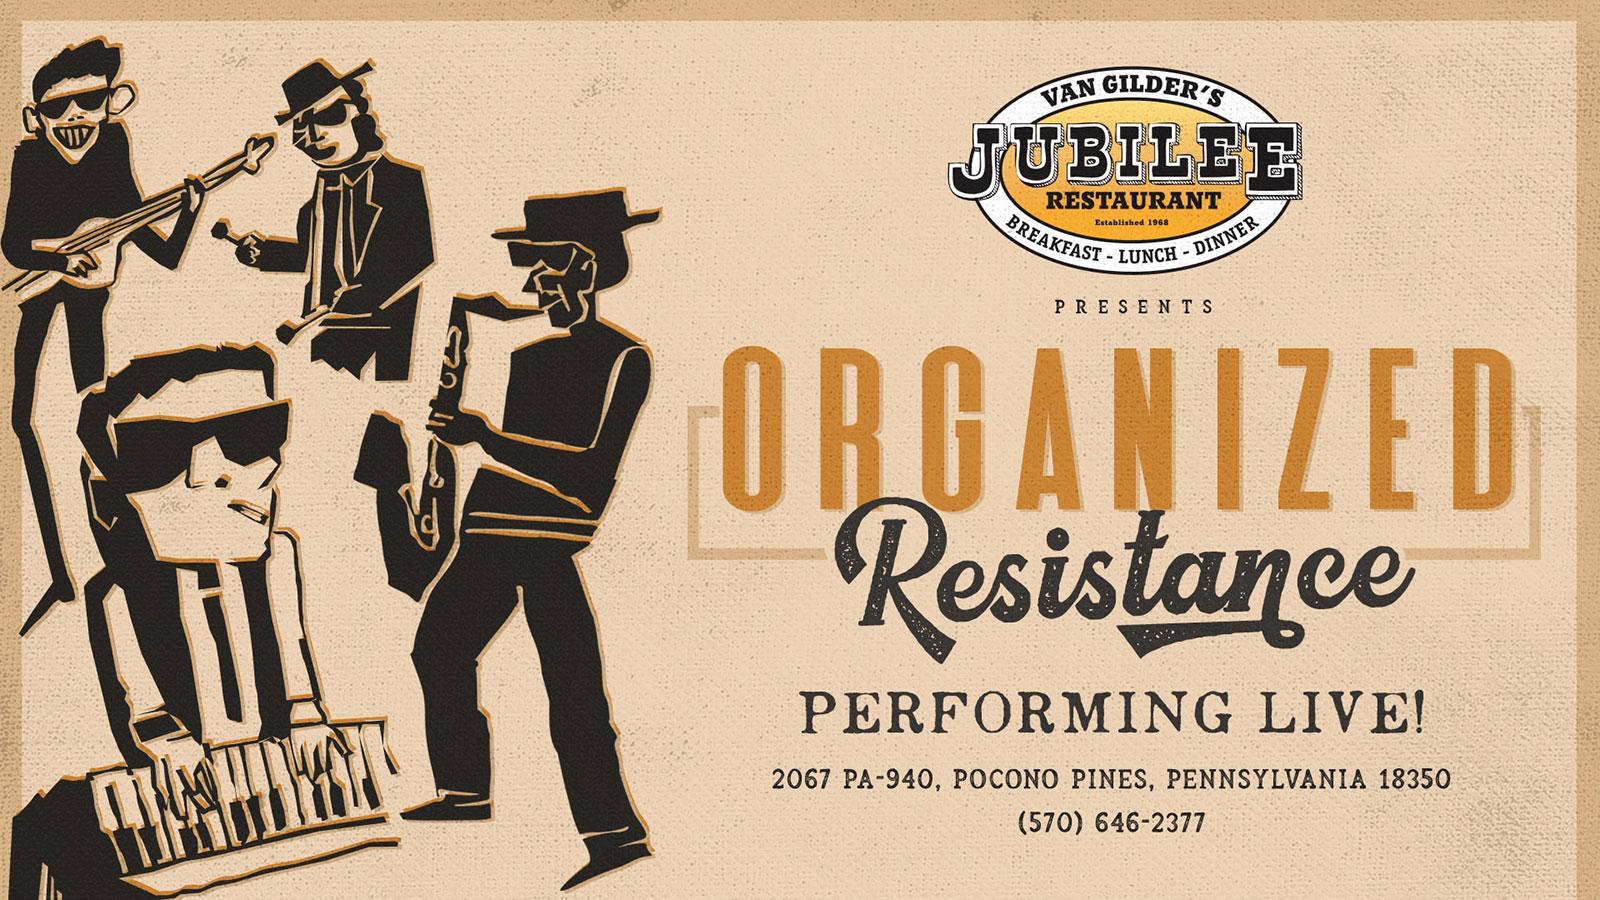 Organized Resistance